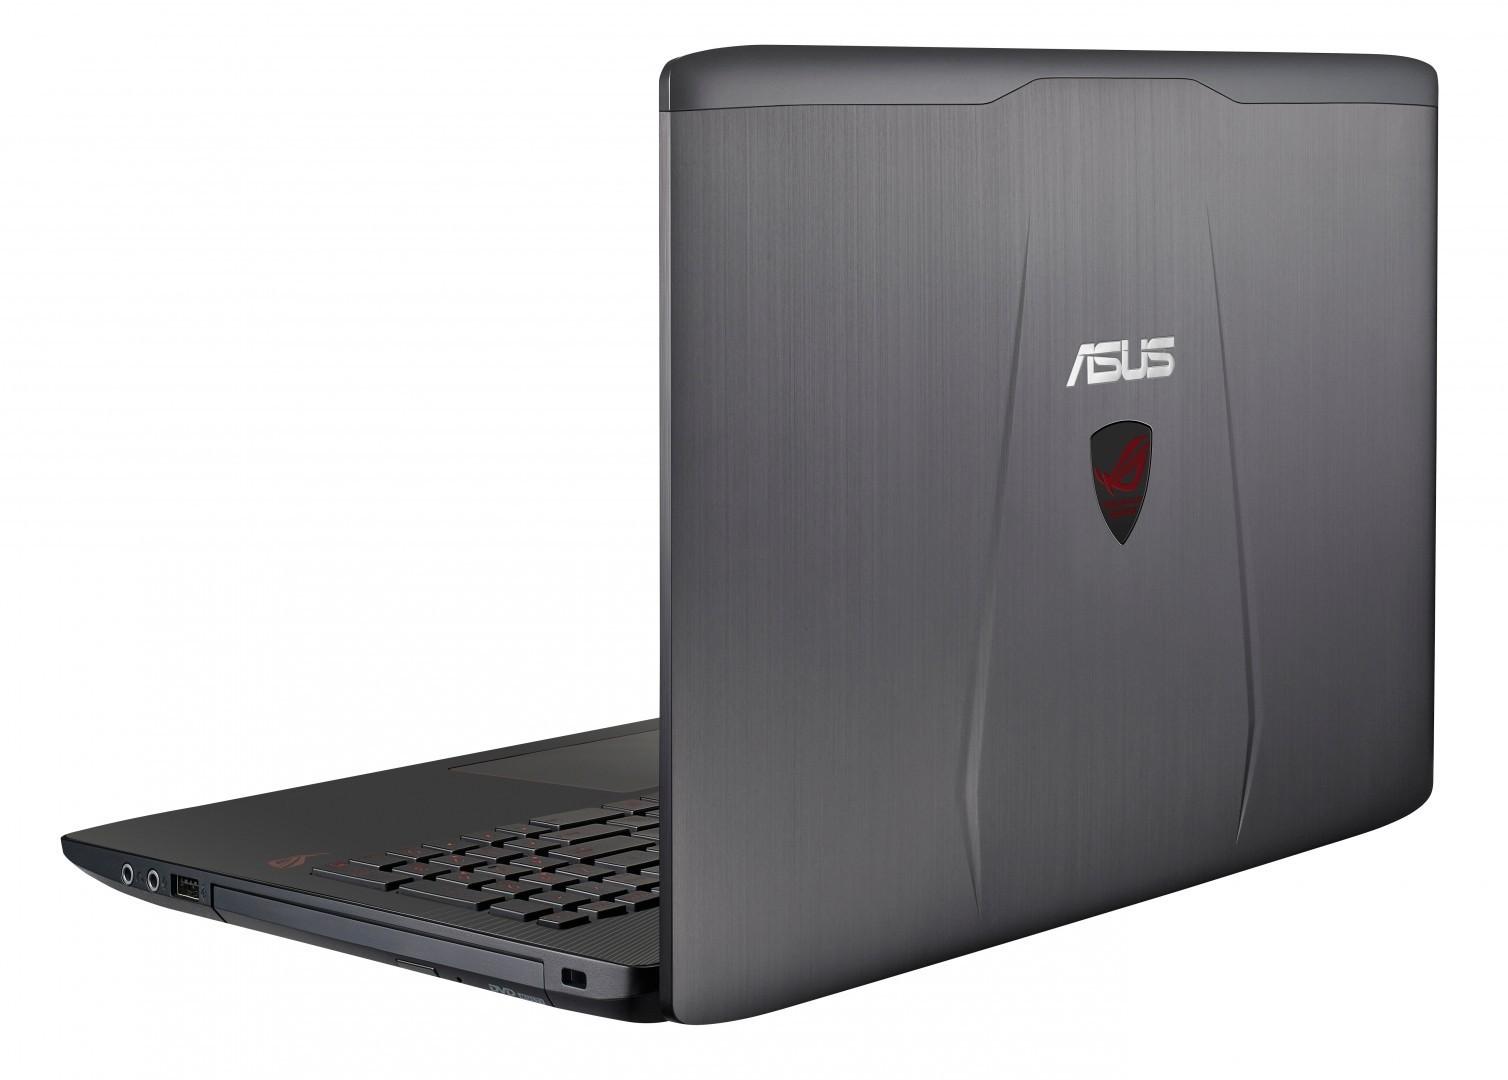 "Asus GL552VW-XO169T 15,6"", Core i5 2,3GHz, 4GB RAM, 1000GB HDD (GL552VW-XO169T)"